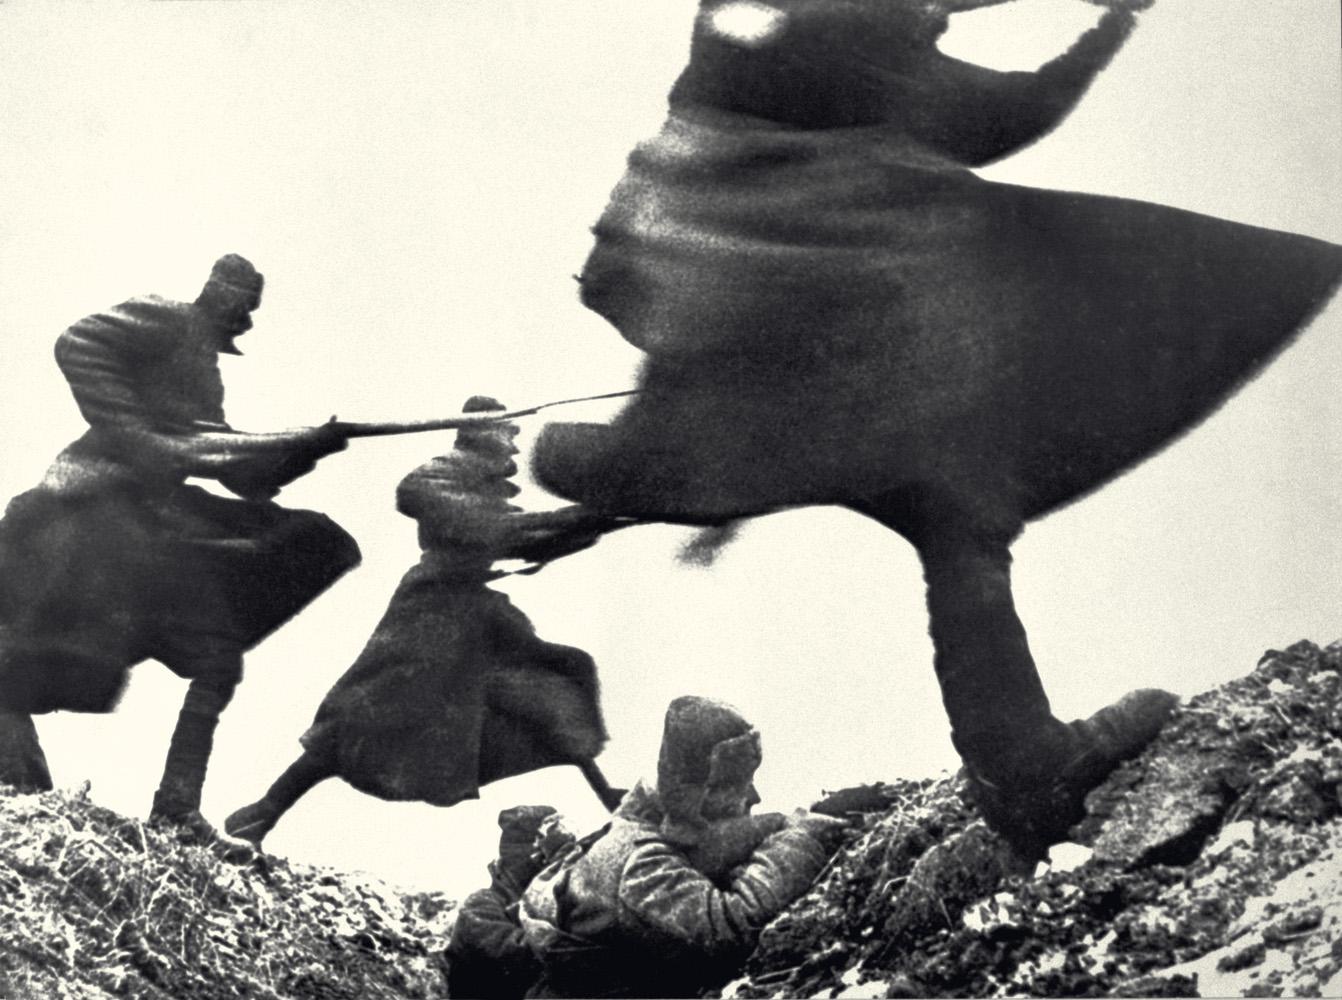 Дмитрий Бальтерманц. Атака. 1941. Цифровой отпечаток. Собрание МАММ